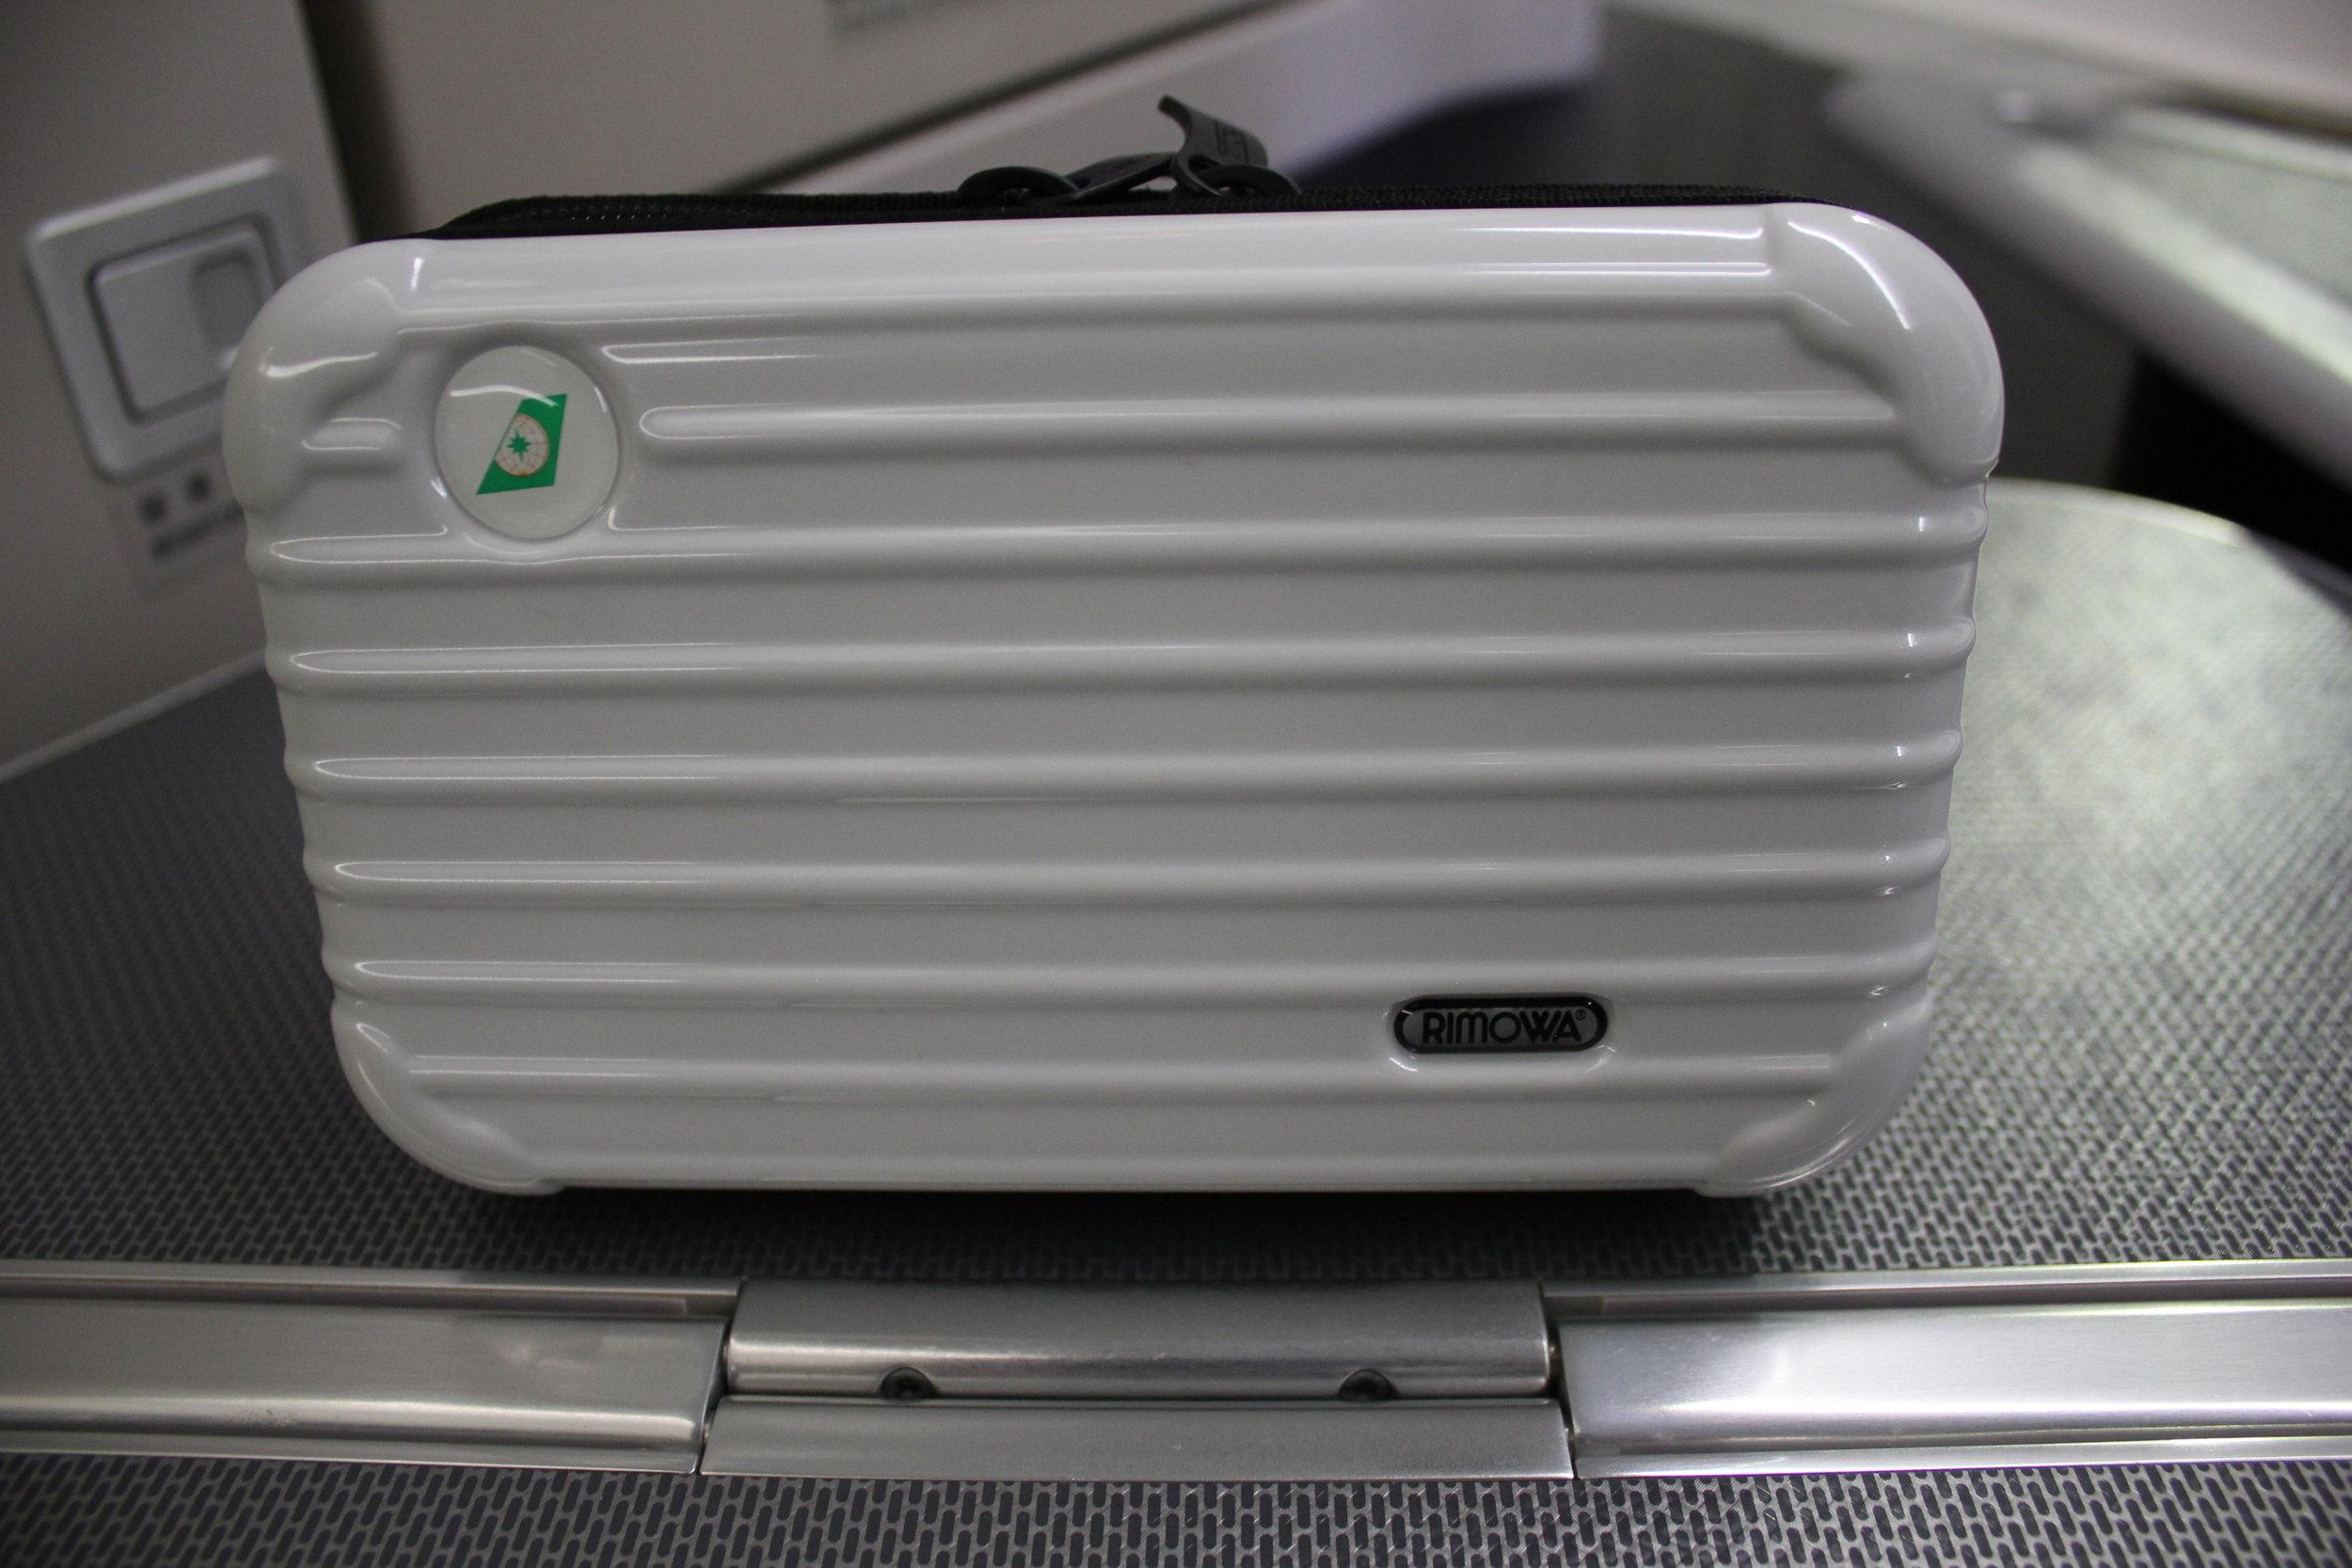 EVA Air business class – Rimowa amenity kit